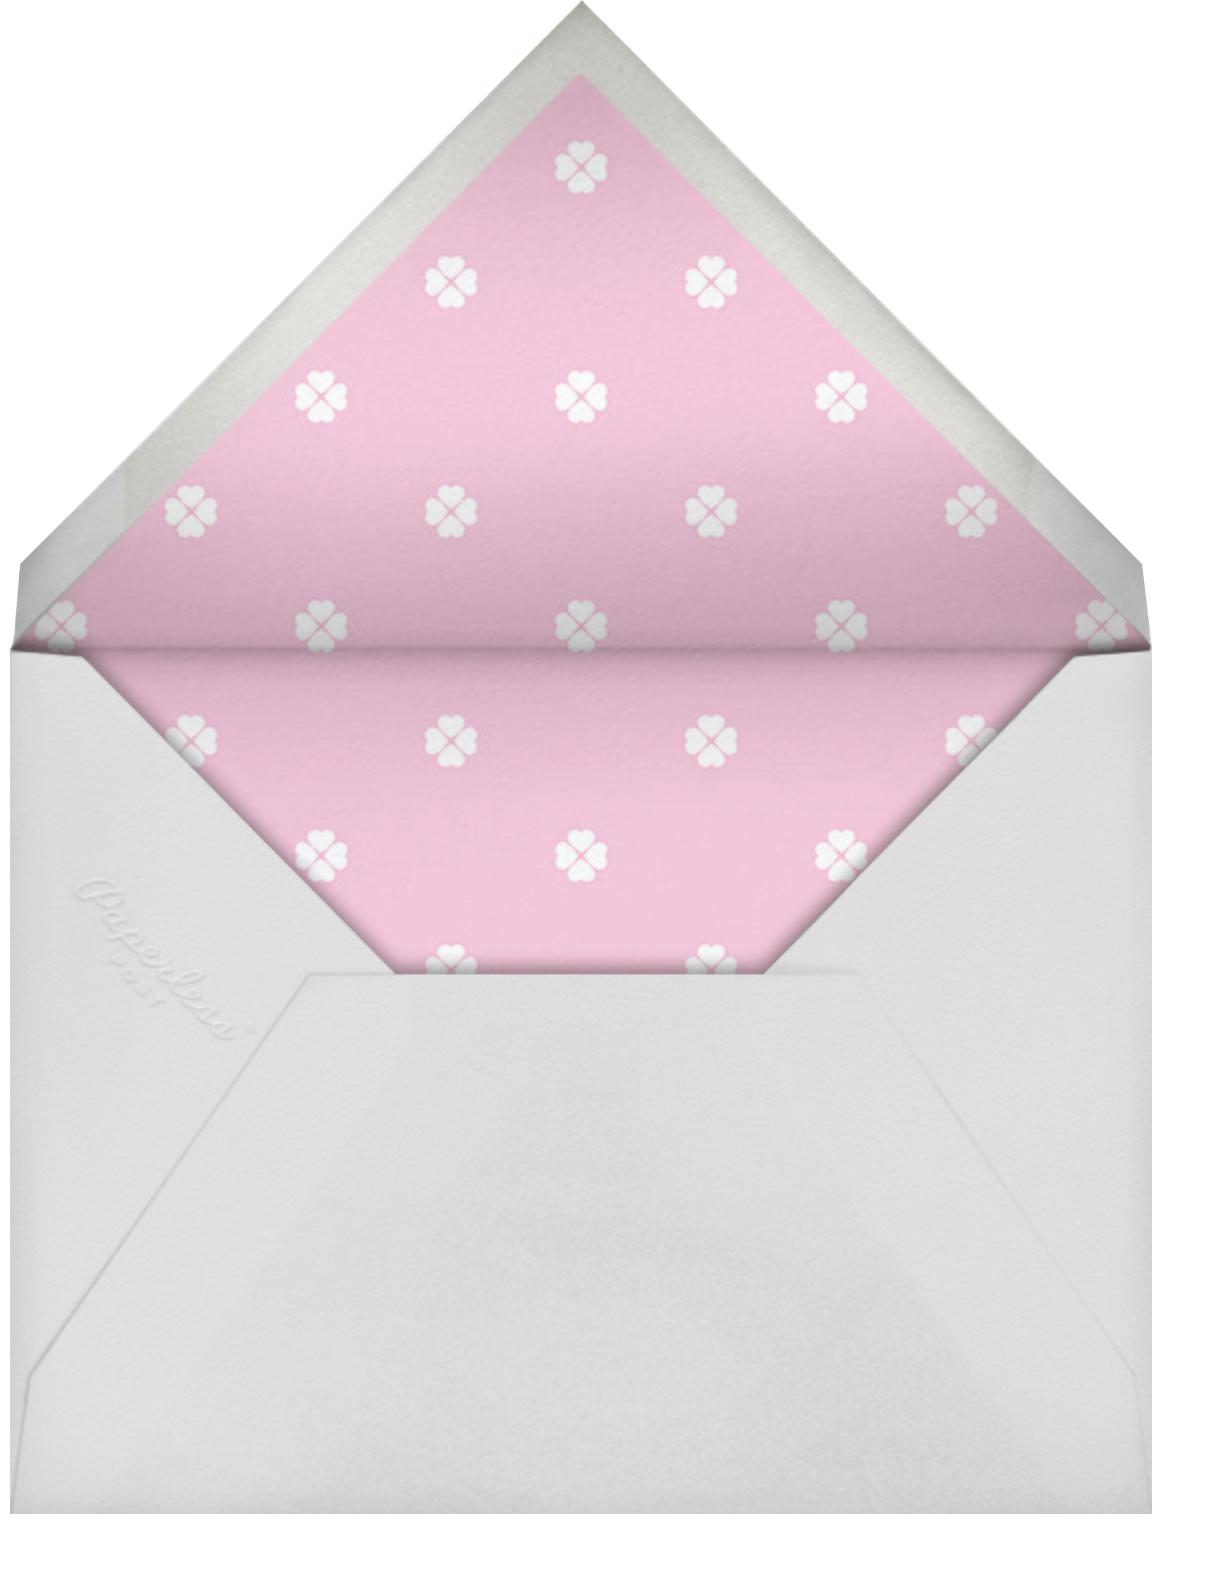 Montauk - Pink - kate spade new york - Save the date - envelope back